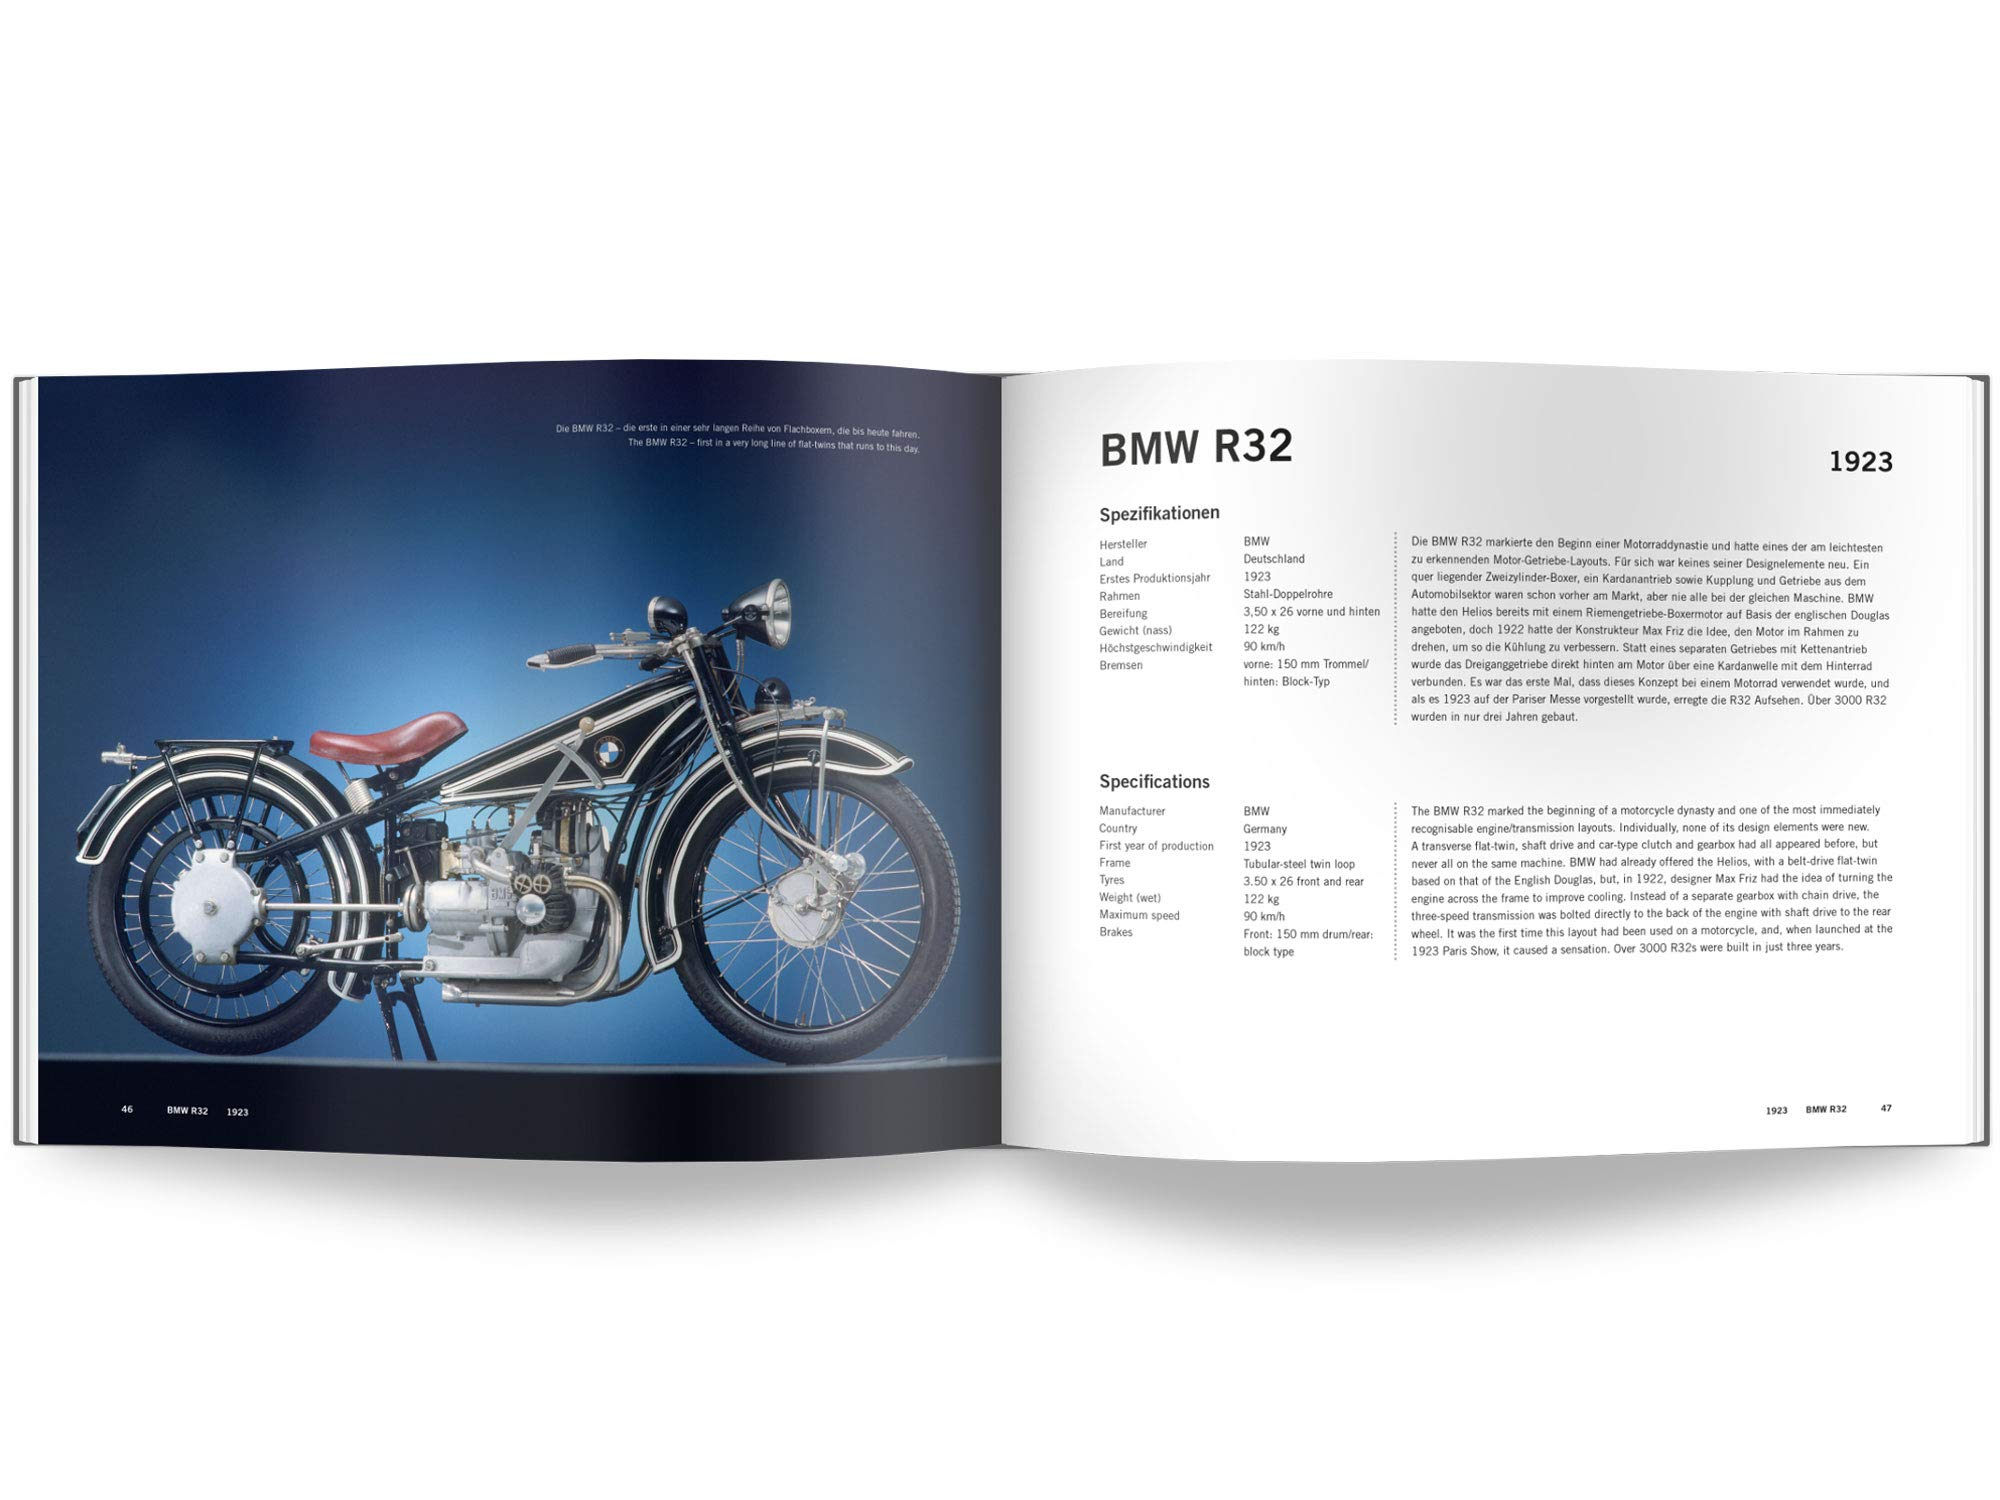 Motor-Klassiker: Motorräder: Die Herzstücke der Motorradlegenden: Amazon.es: Peter Henshaw: Libros en idiomas extranjeros